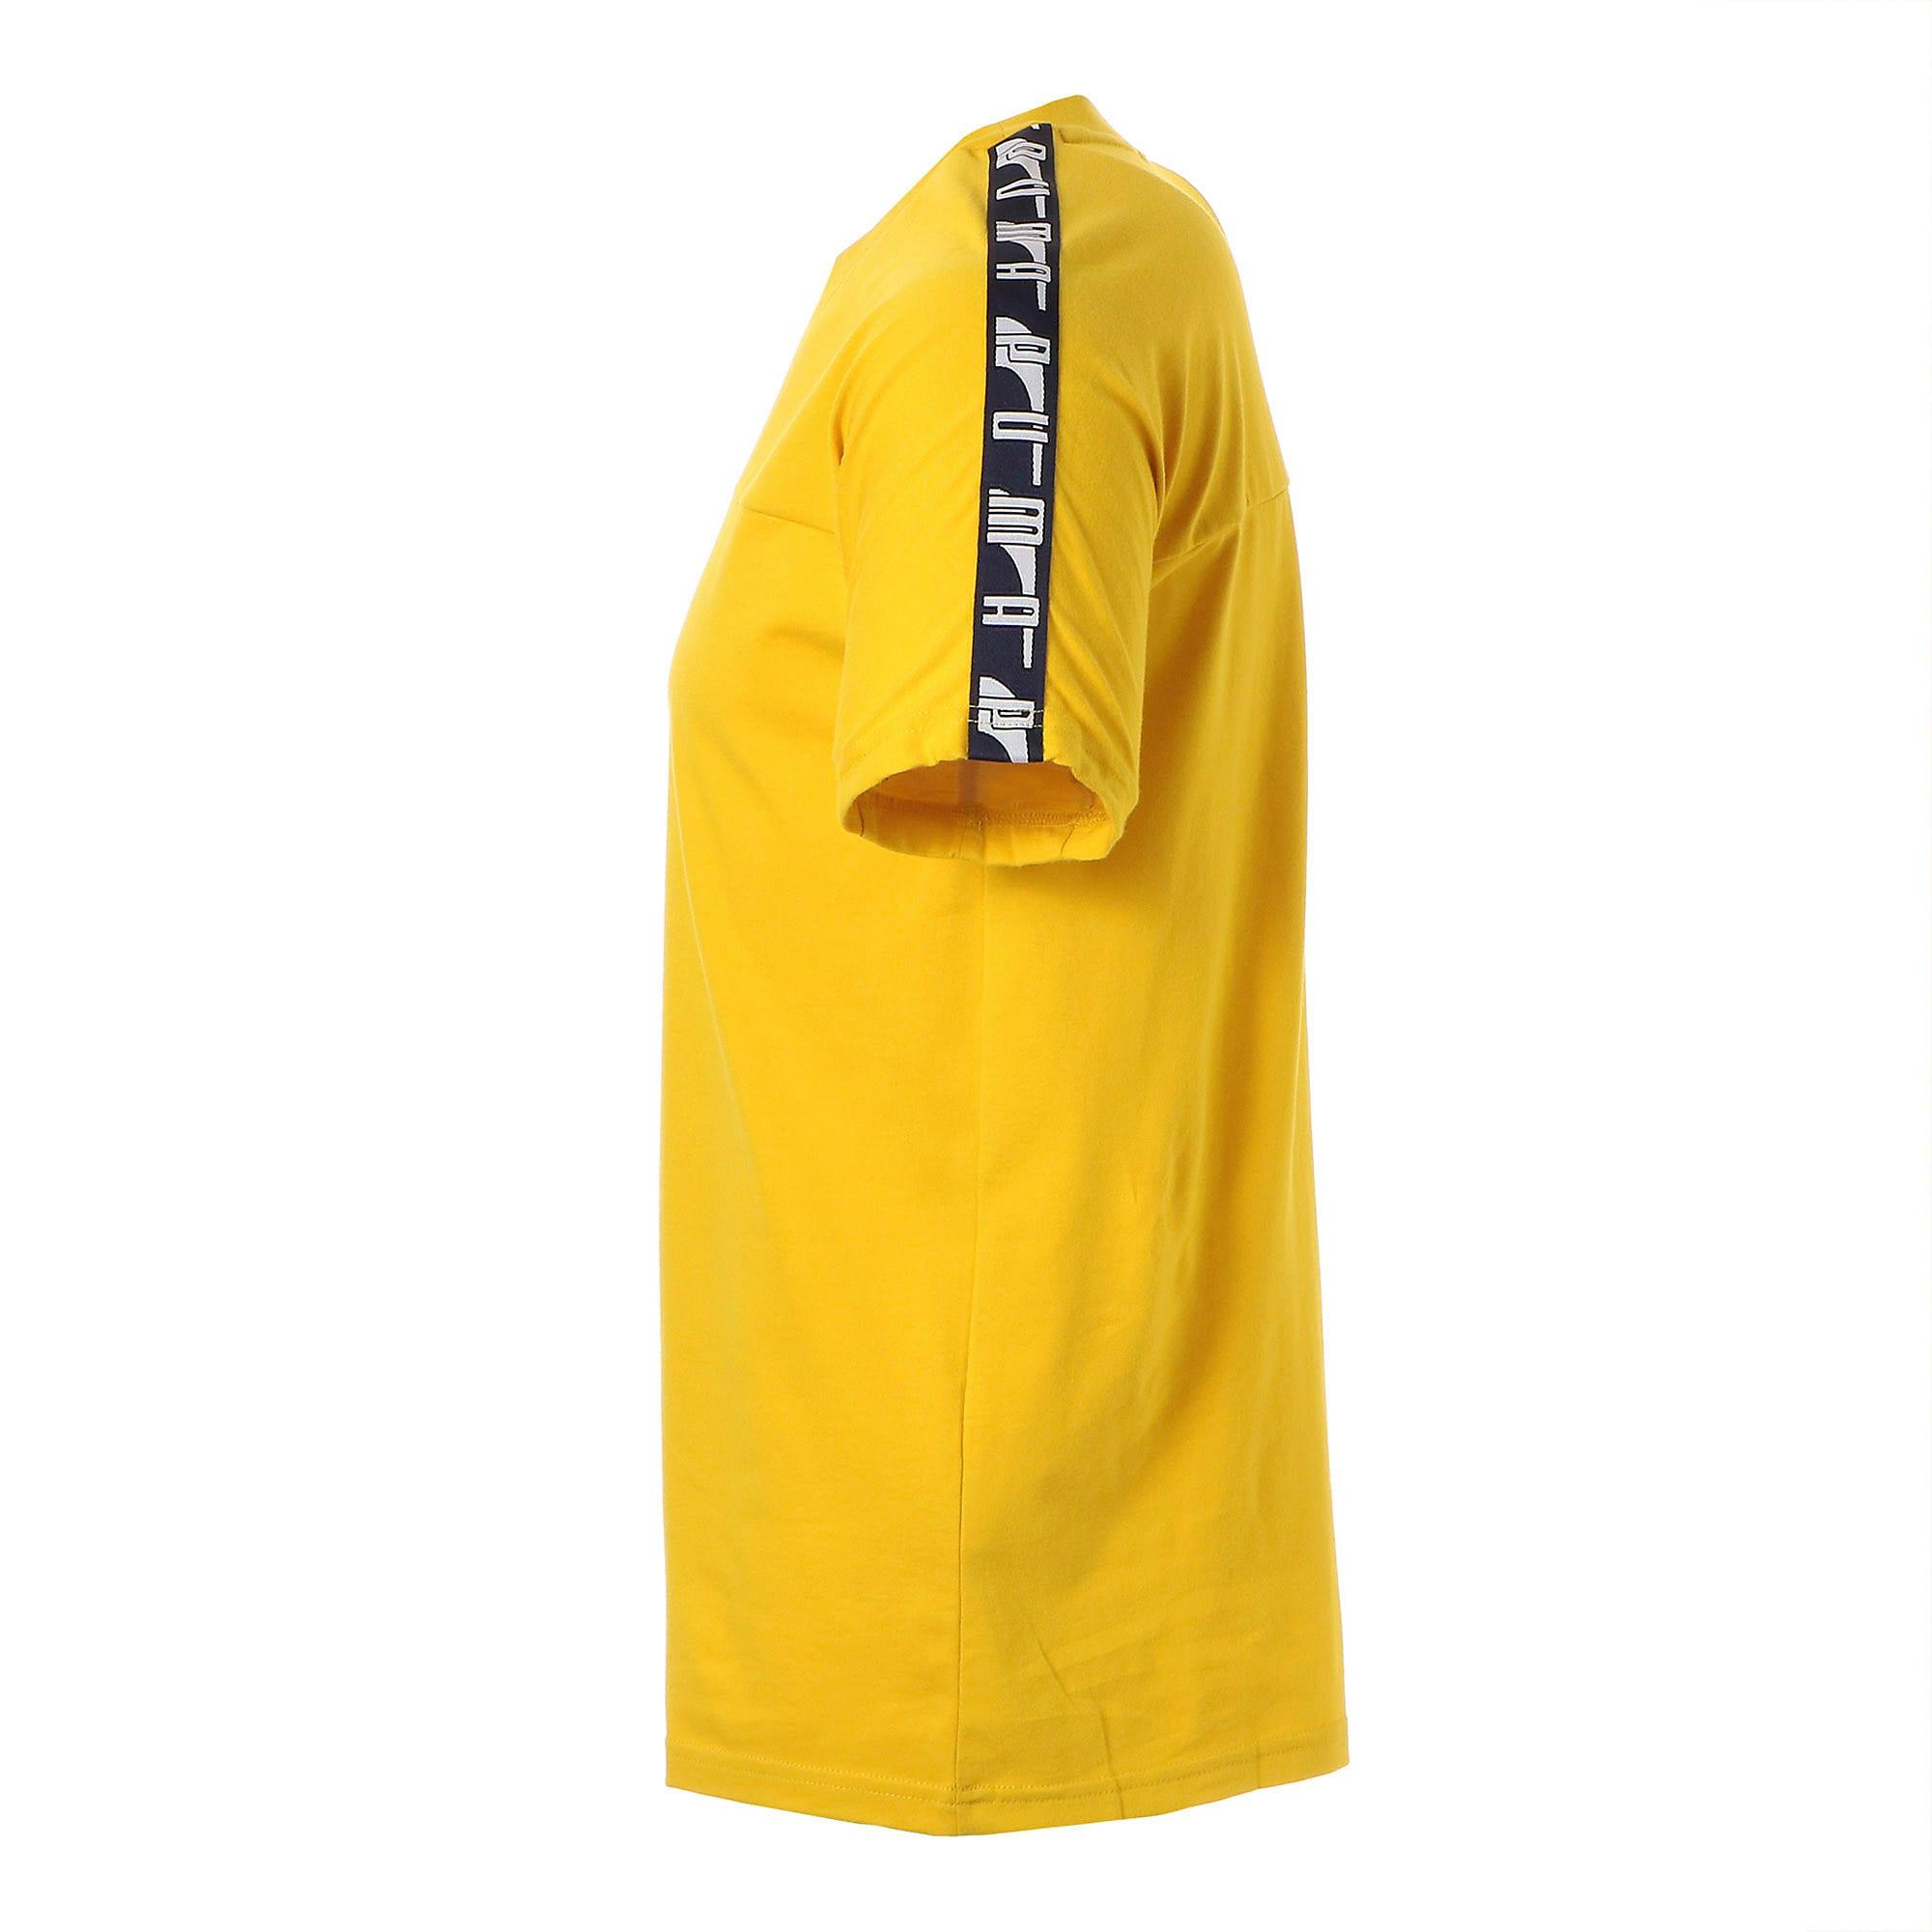 Thumbnail 5 of PUMA XTG SS Tシャツ, Sulphur, medium-JPN